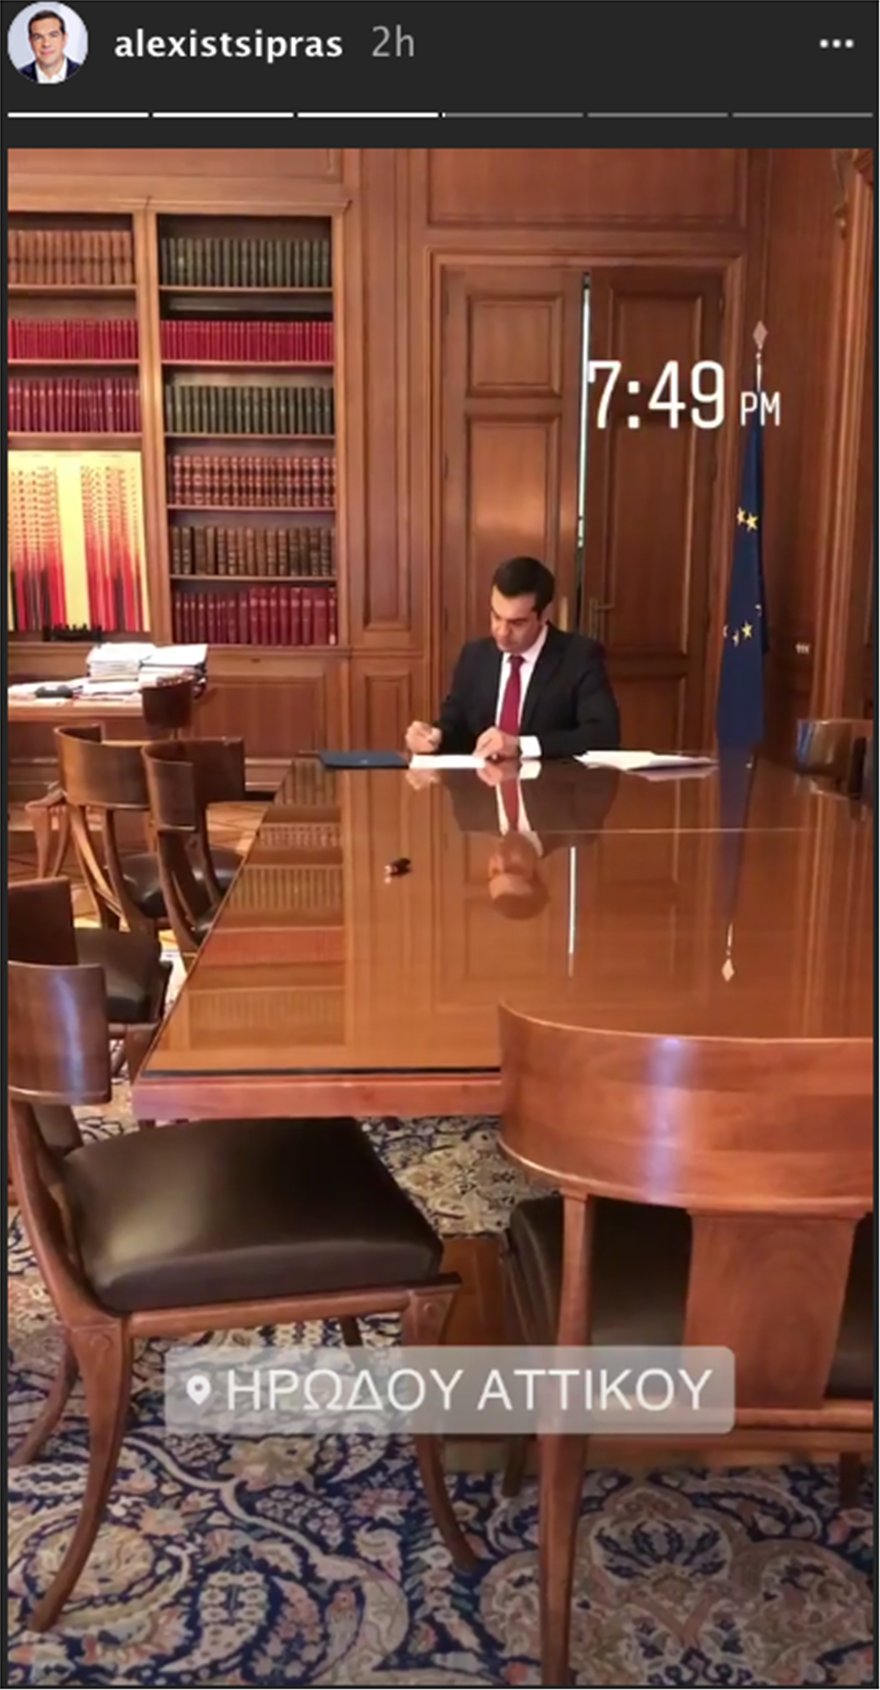 tsipras-insta-gra5